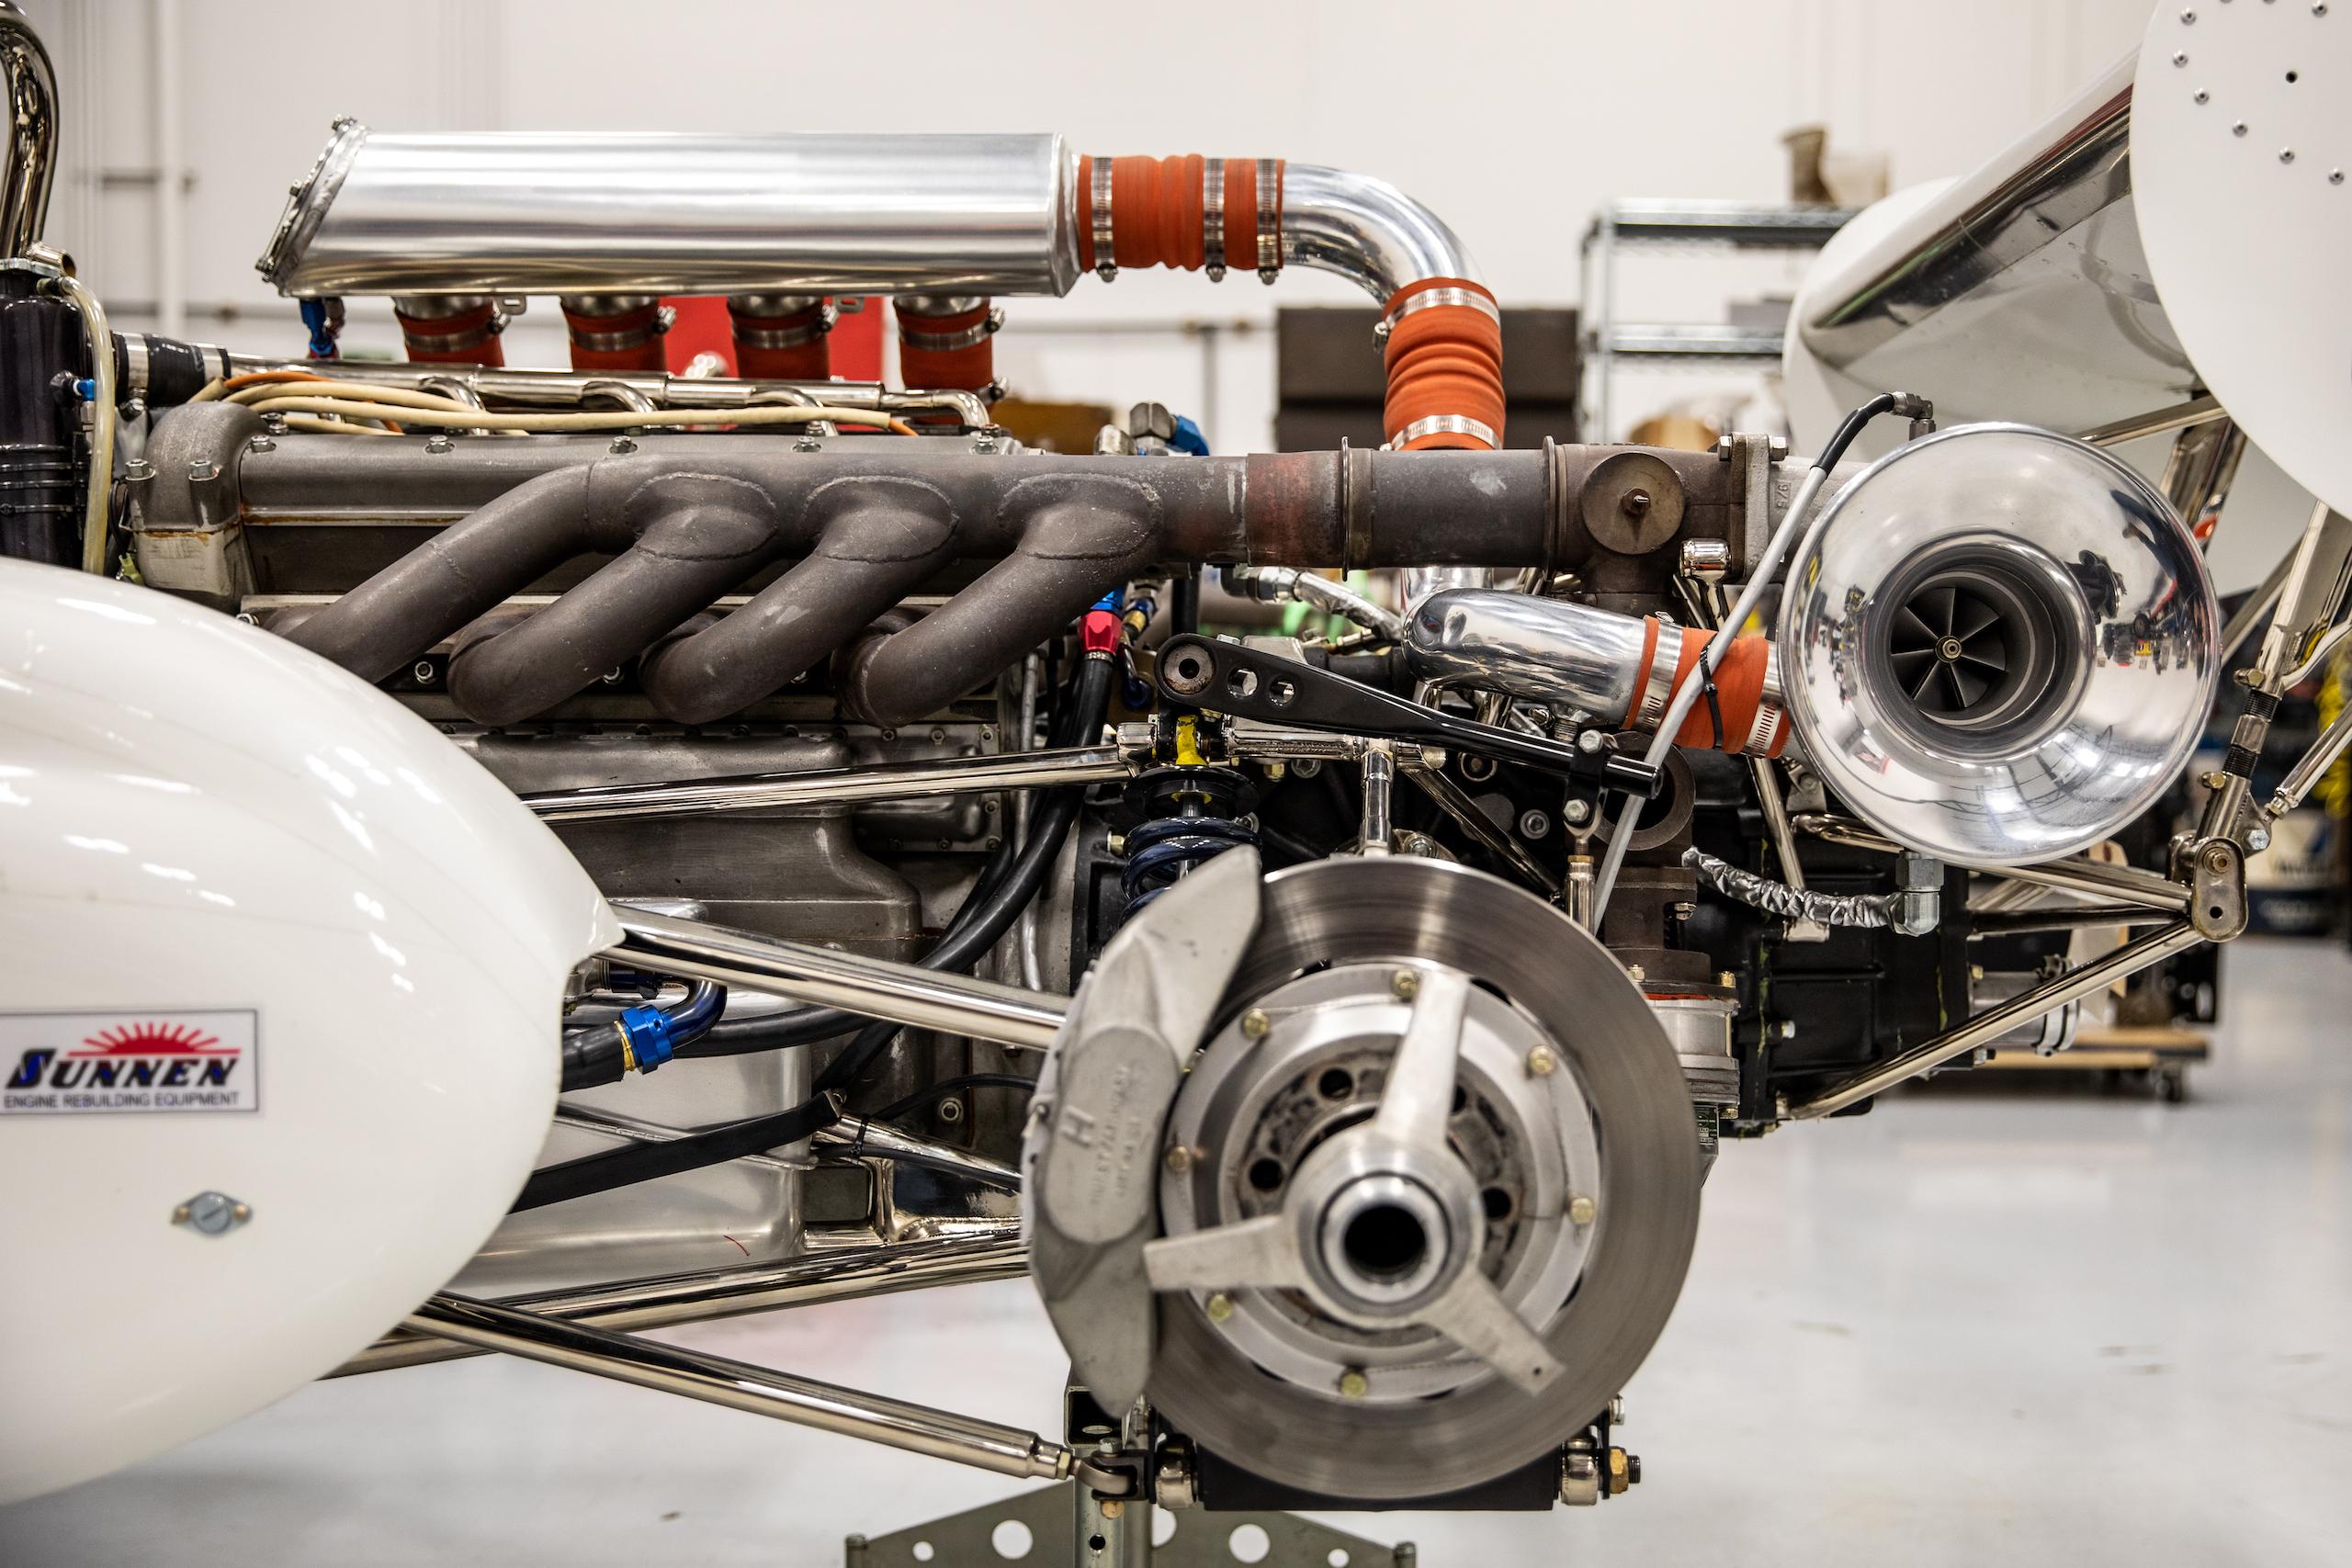 Turn 4 Restorations engine